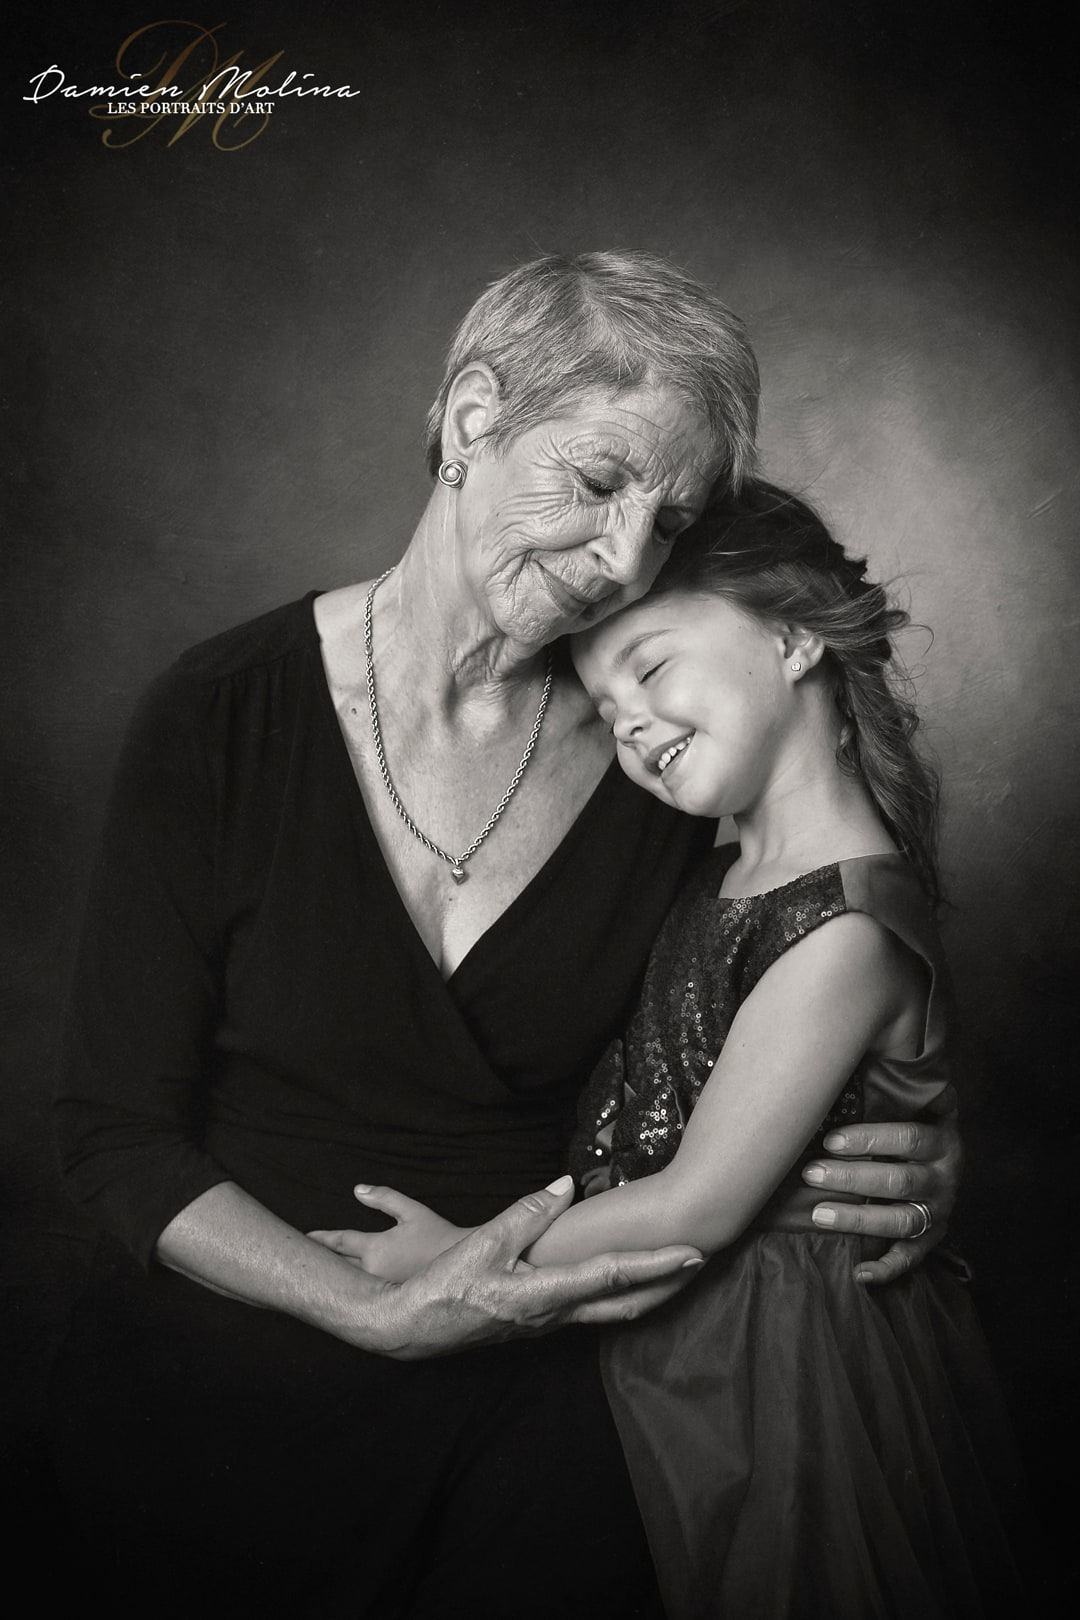 photographe strasbourg famille portrait molina c05